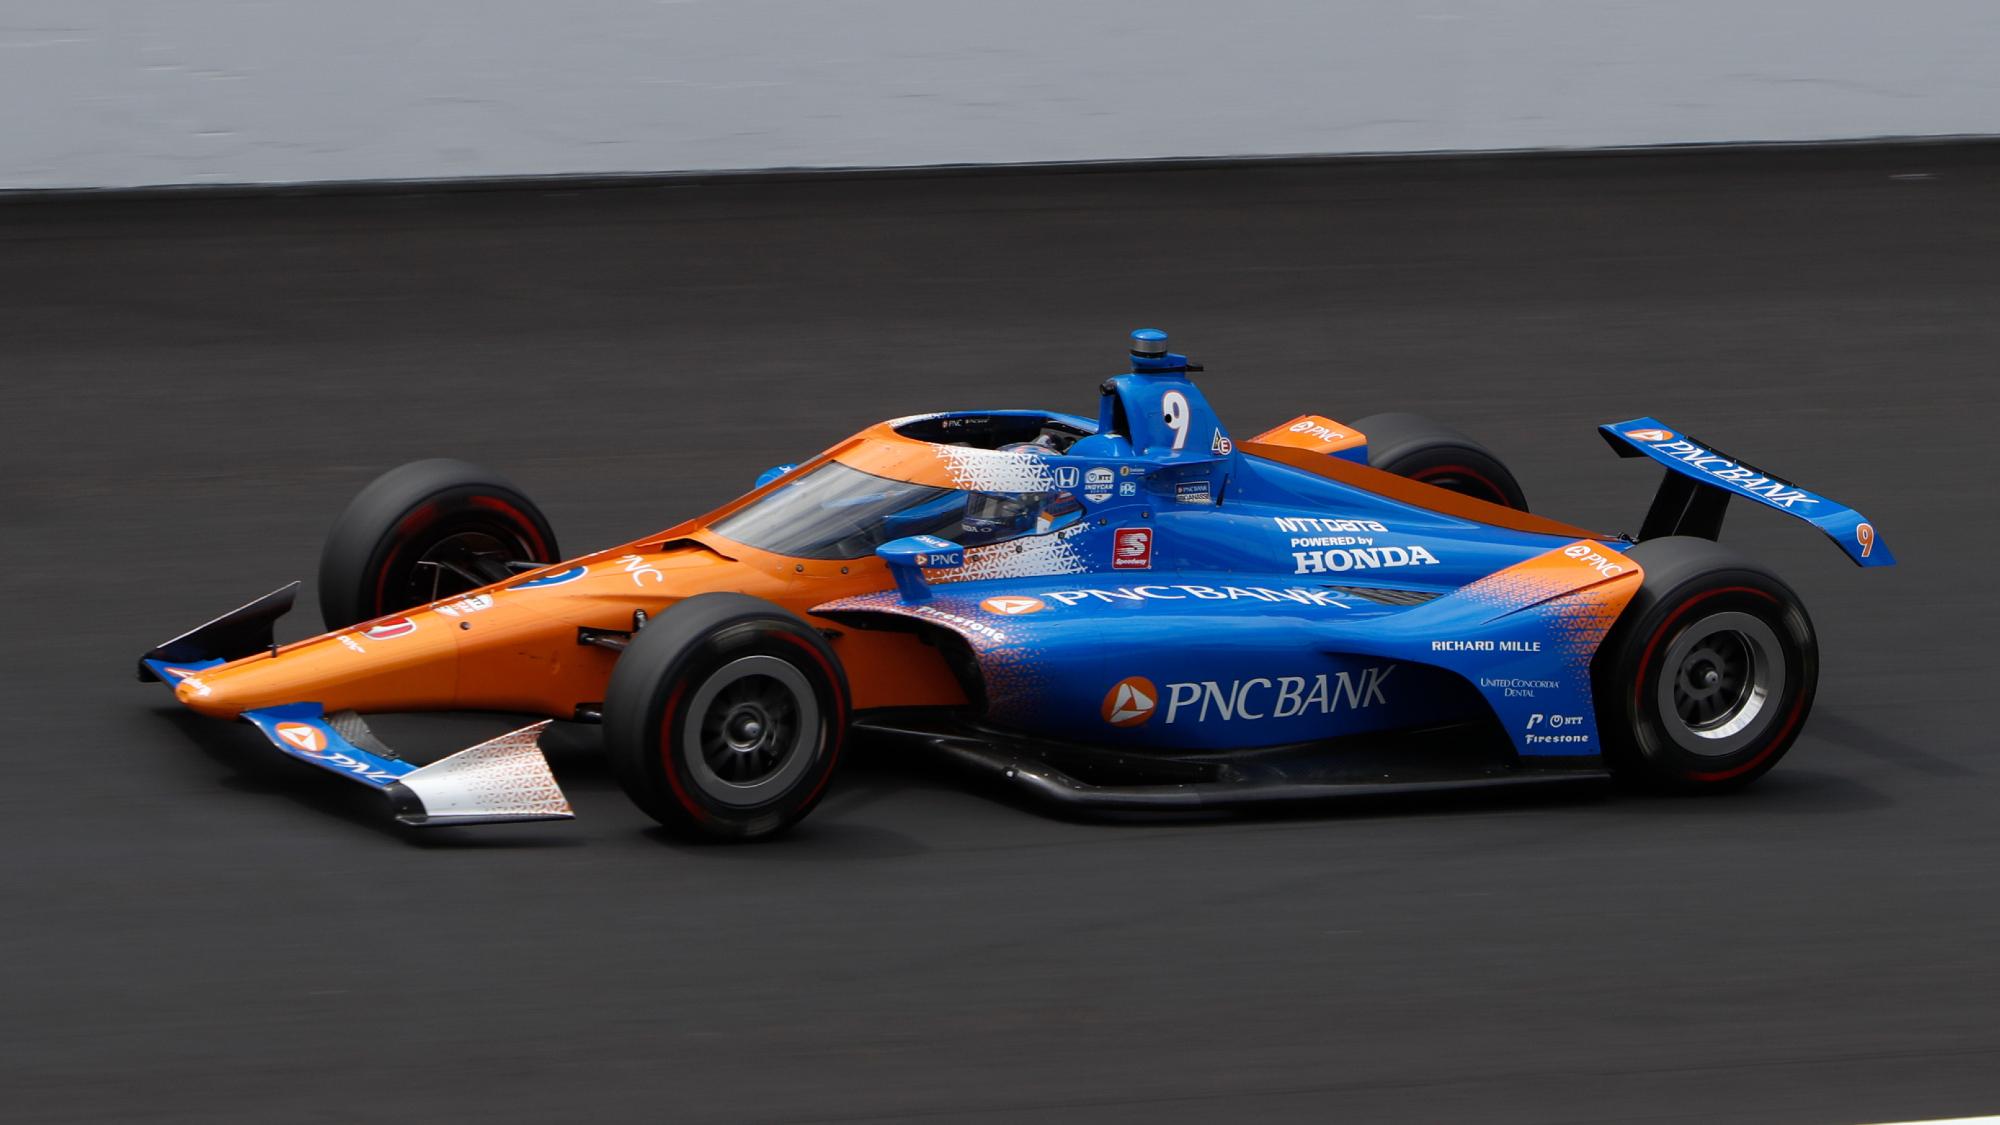 Scott Dixon, 2020 Indy 500